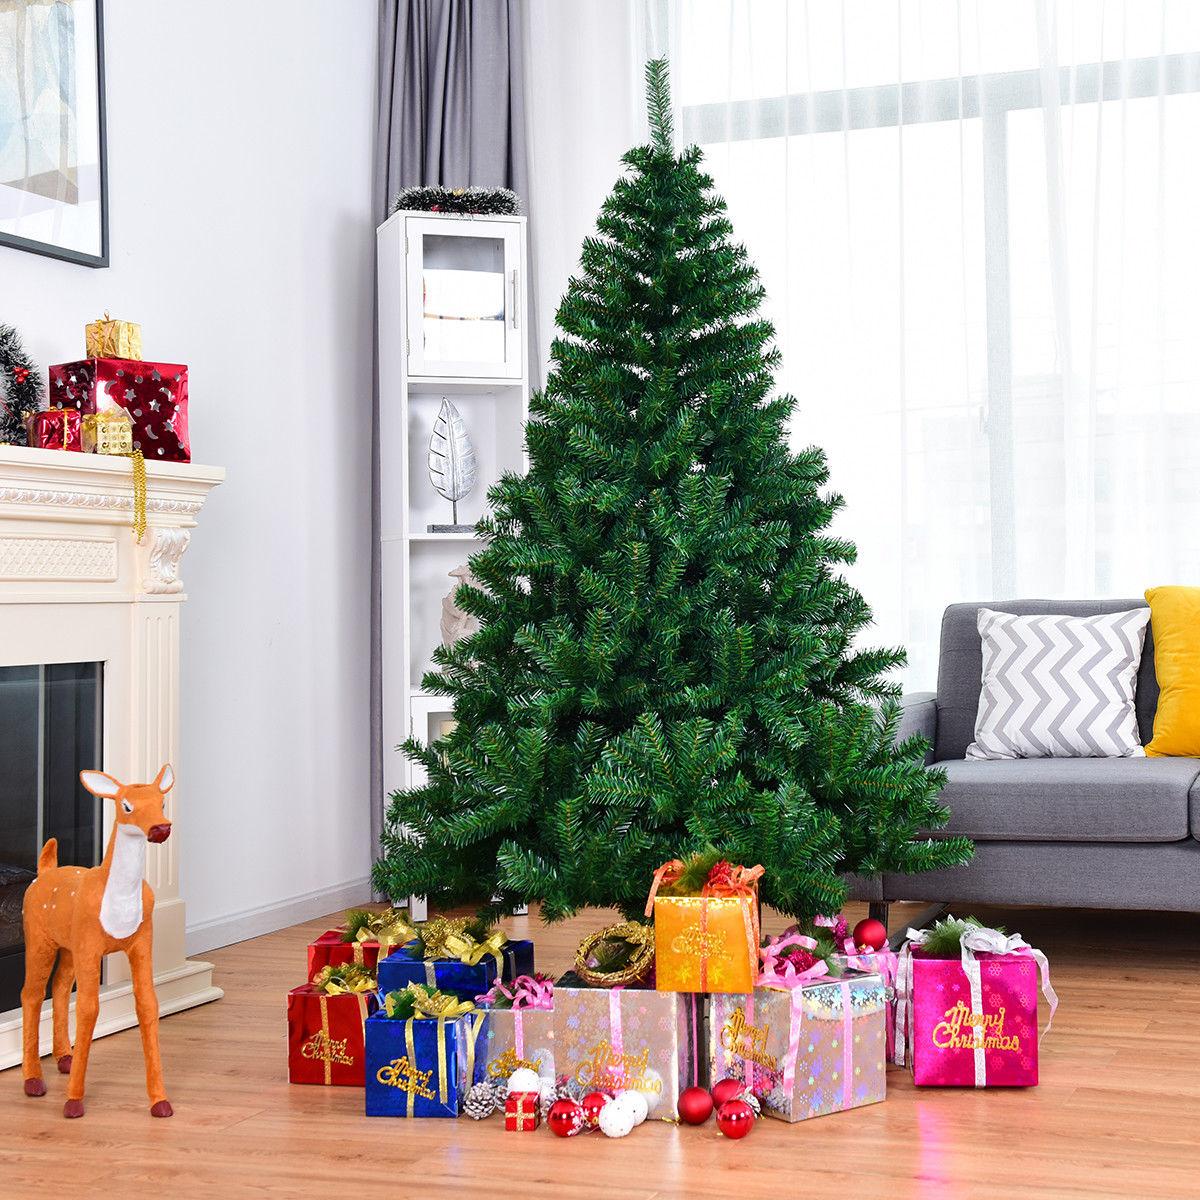 Costway 6ft Pvc Artificial Christmas Tree 1000 Tips Premium Hinged W Solid Metal Legs 0